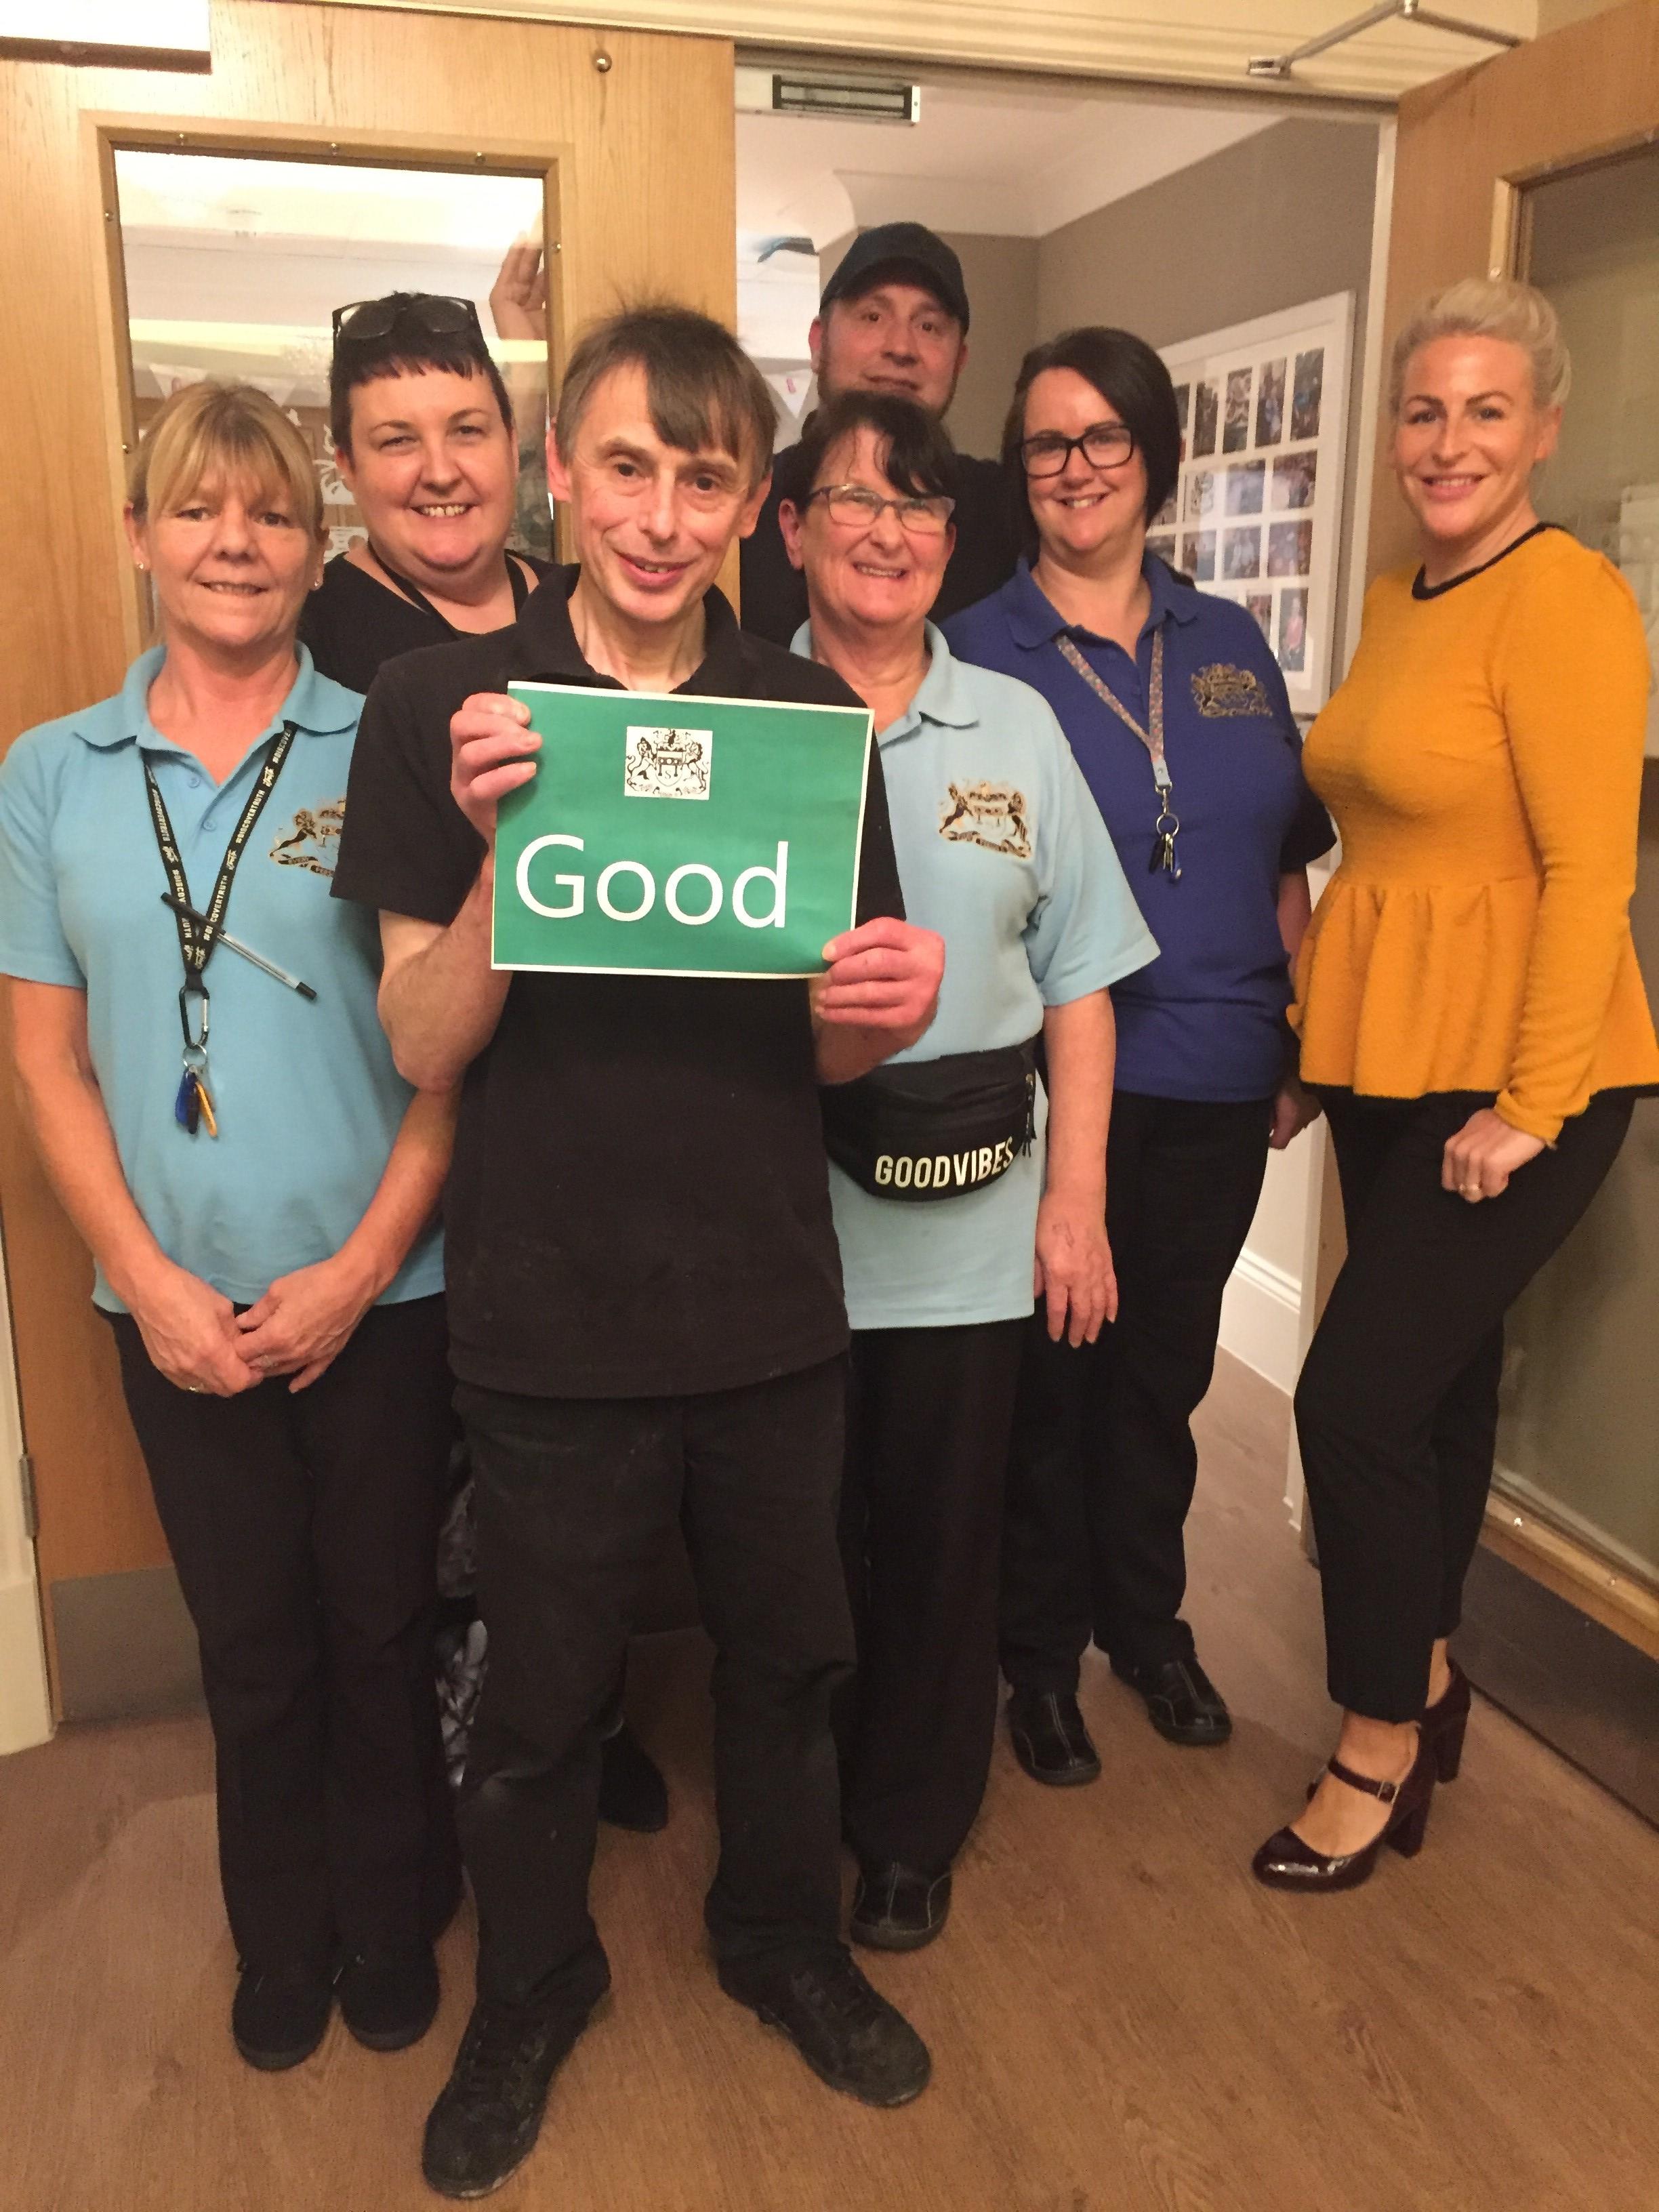 , Inspectors praise standards at Mawdesley care home, Skem News - The Top Source for Skelmersdale News